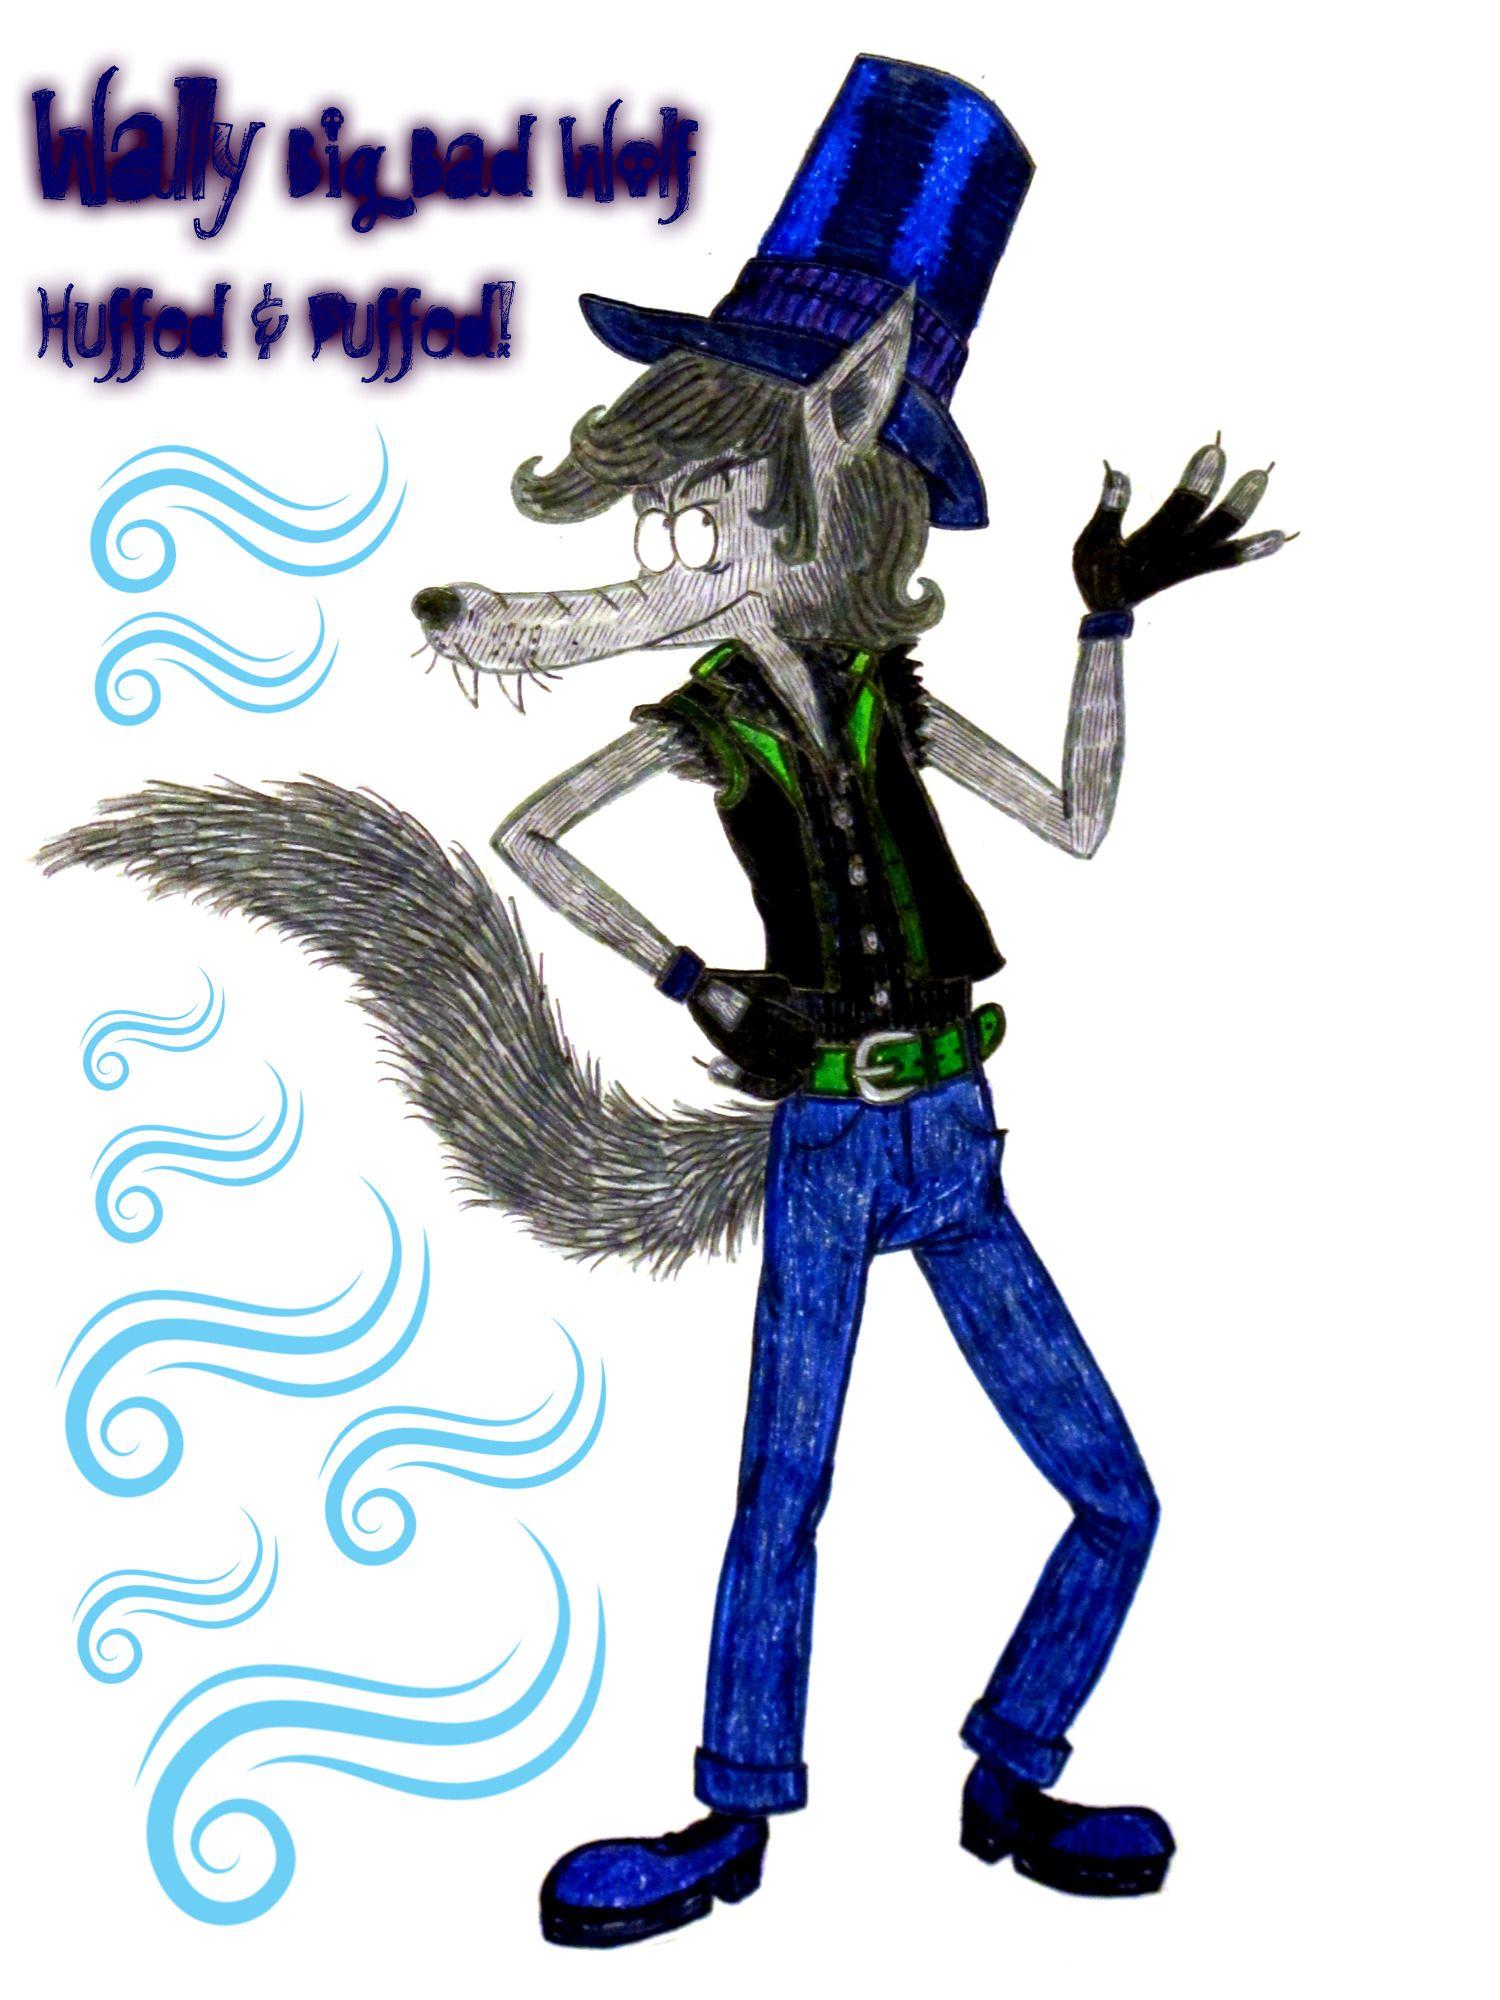 Wally Big Bad Wolf Huffed And Puffed